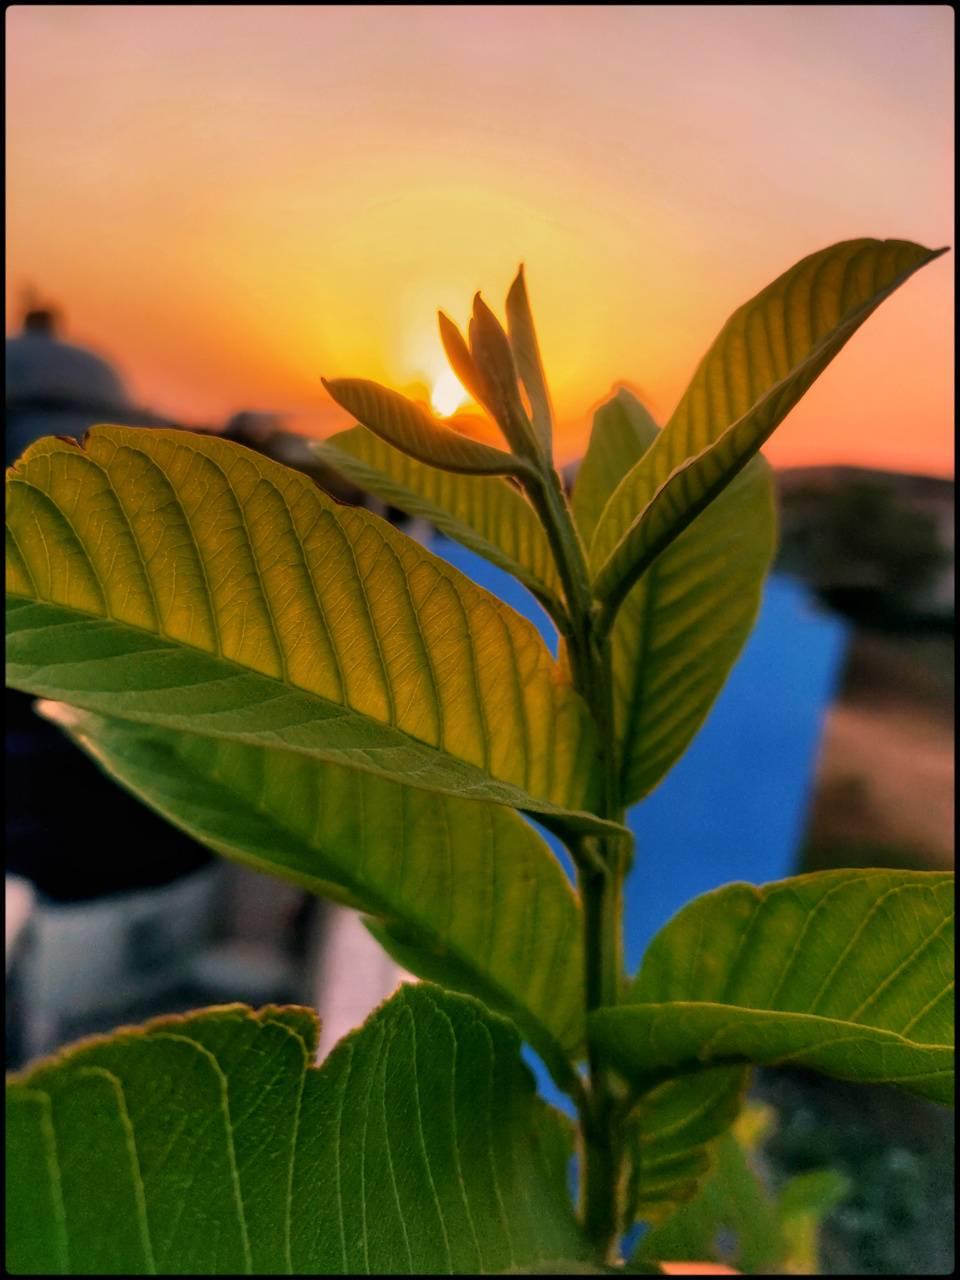 Leaf with sun